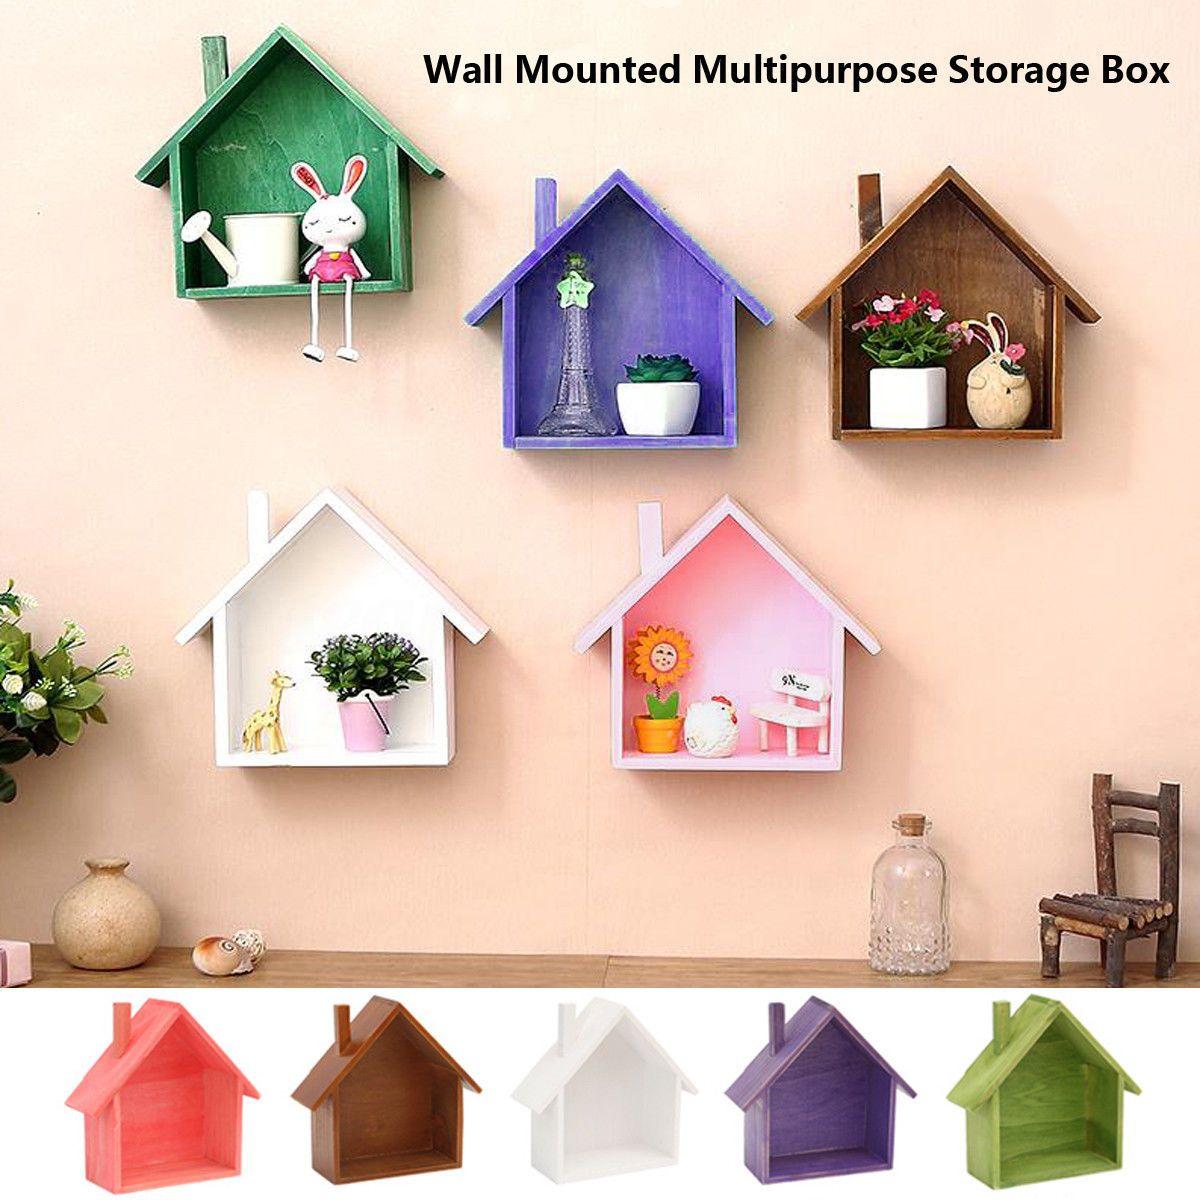 Etagere Support Murale Rangement Stockage Bois Maison Forme